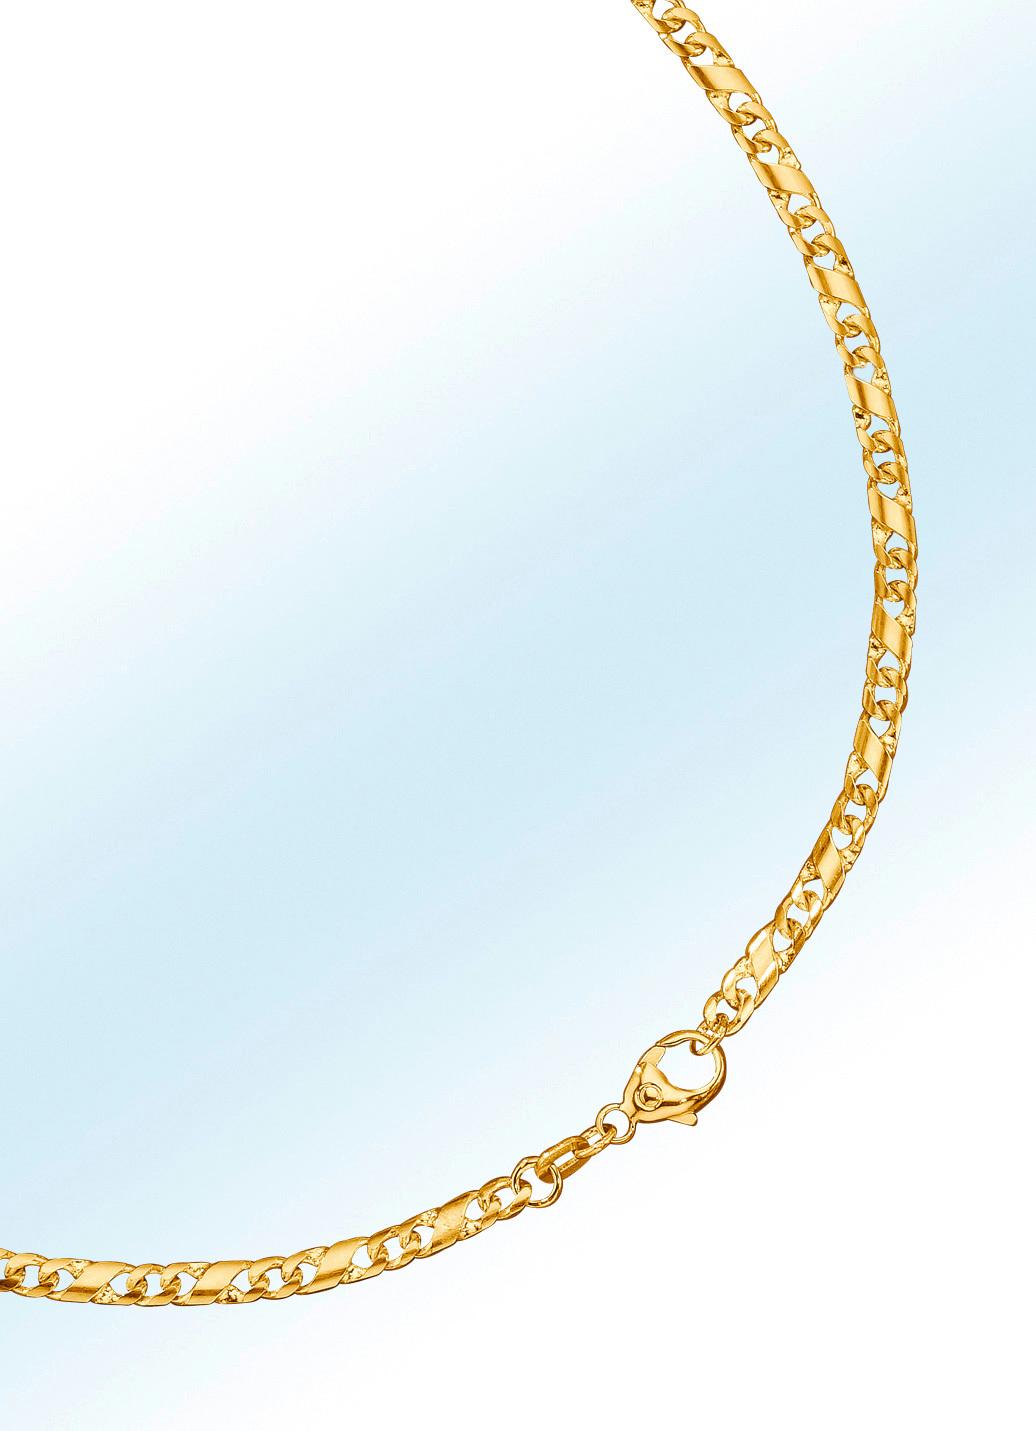 Goldkette gangster png  Herren-Goldschmuck - Schmuck & Uhren | BADER